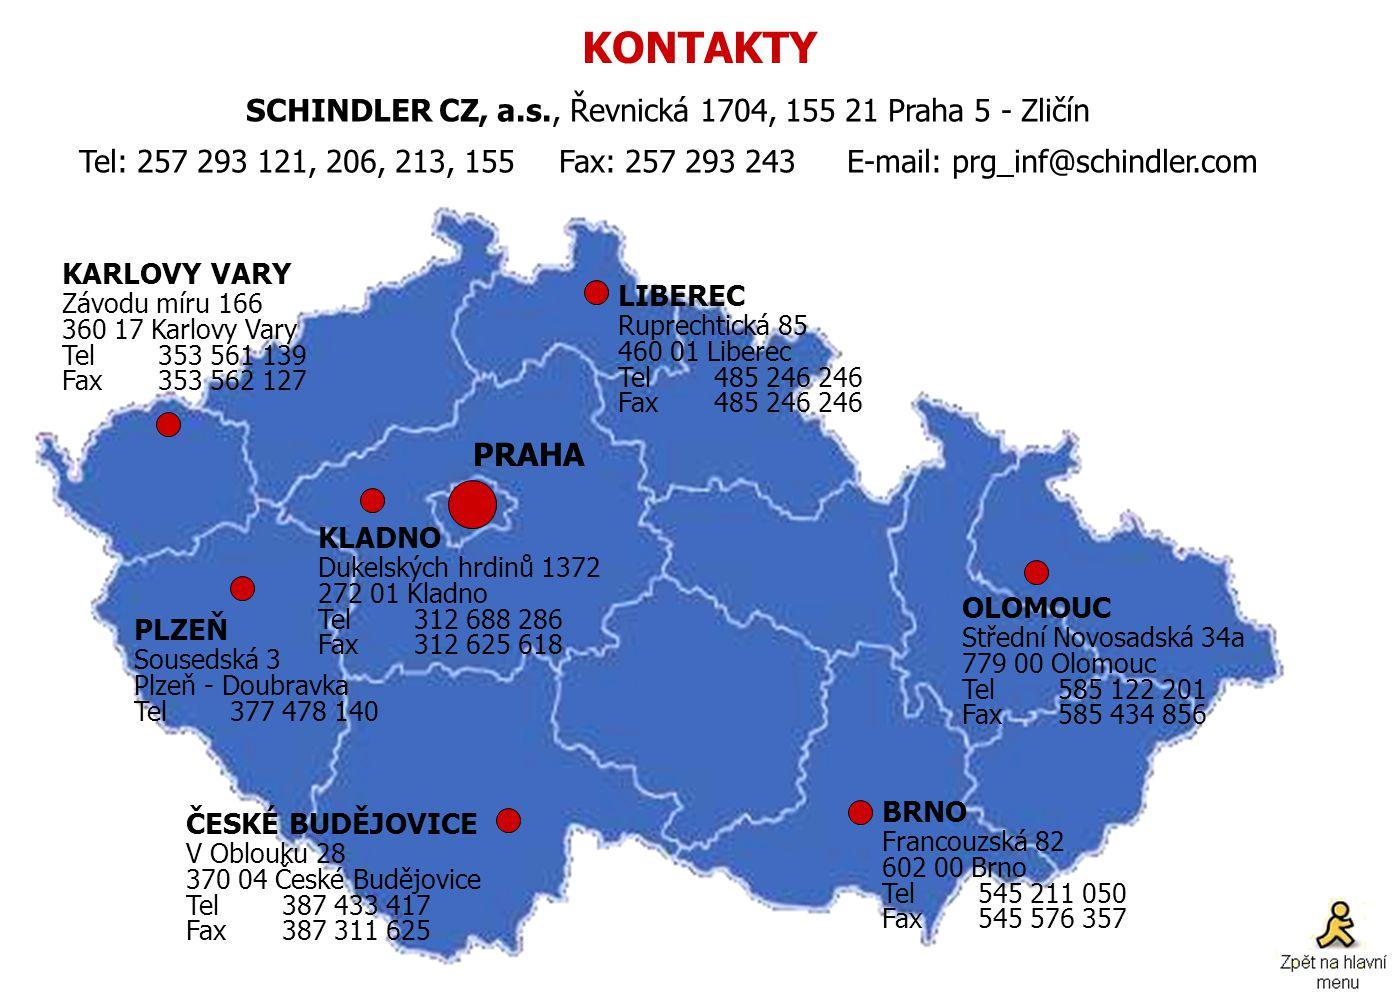 SCHINDLER CZ, a.s., Řevnická 1704, 155 21 Praha 5 - Zličín